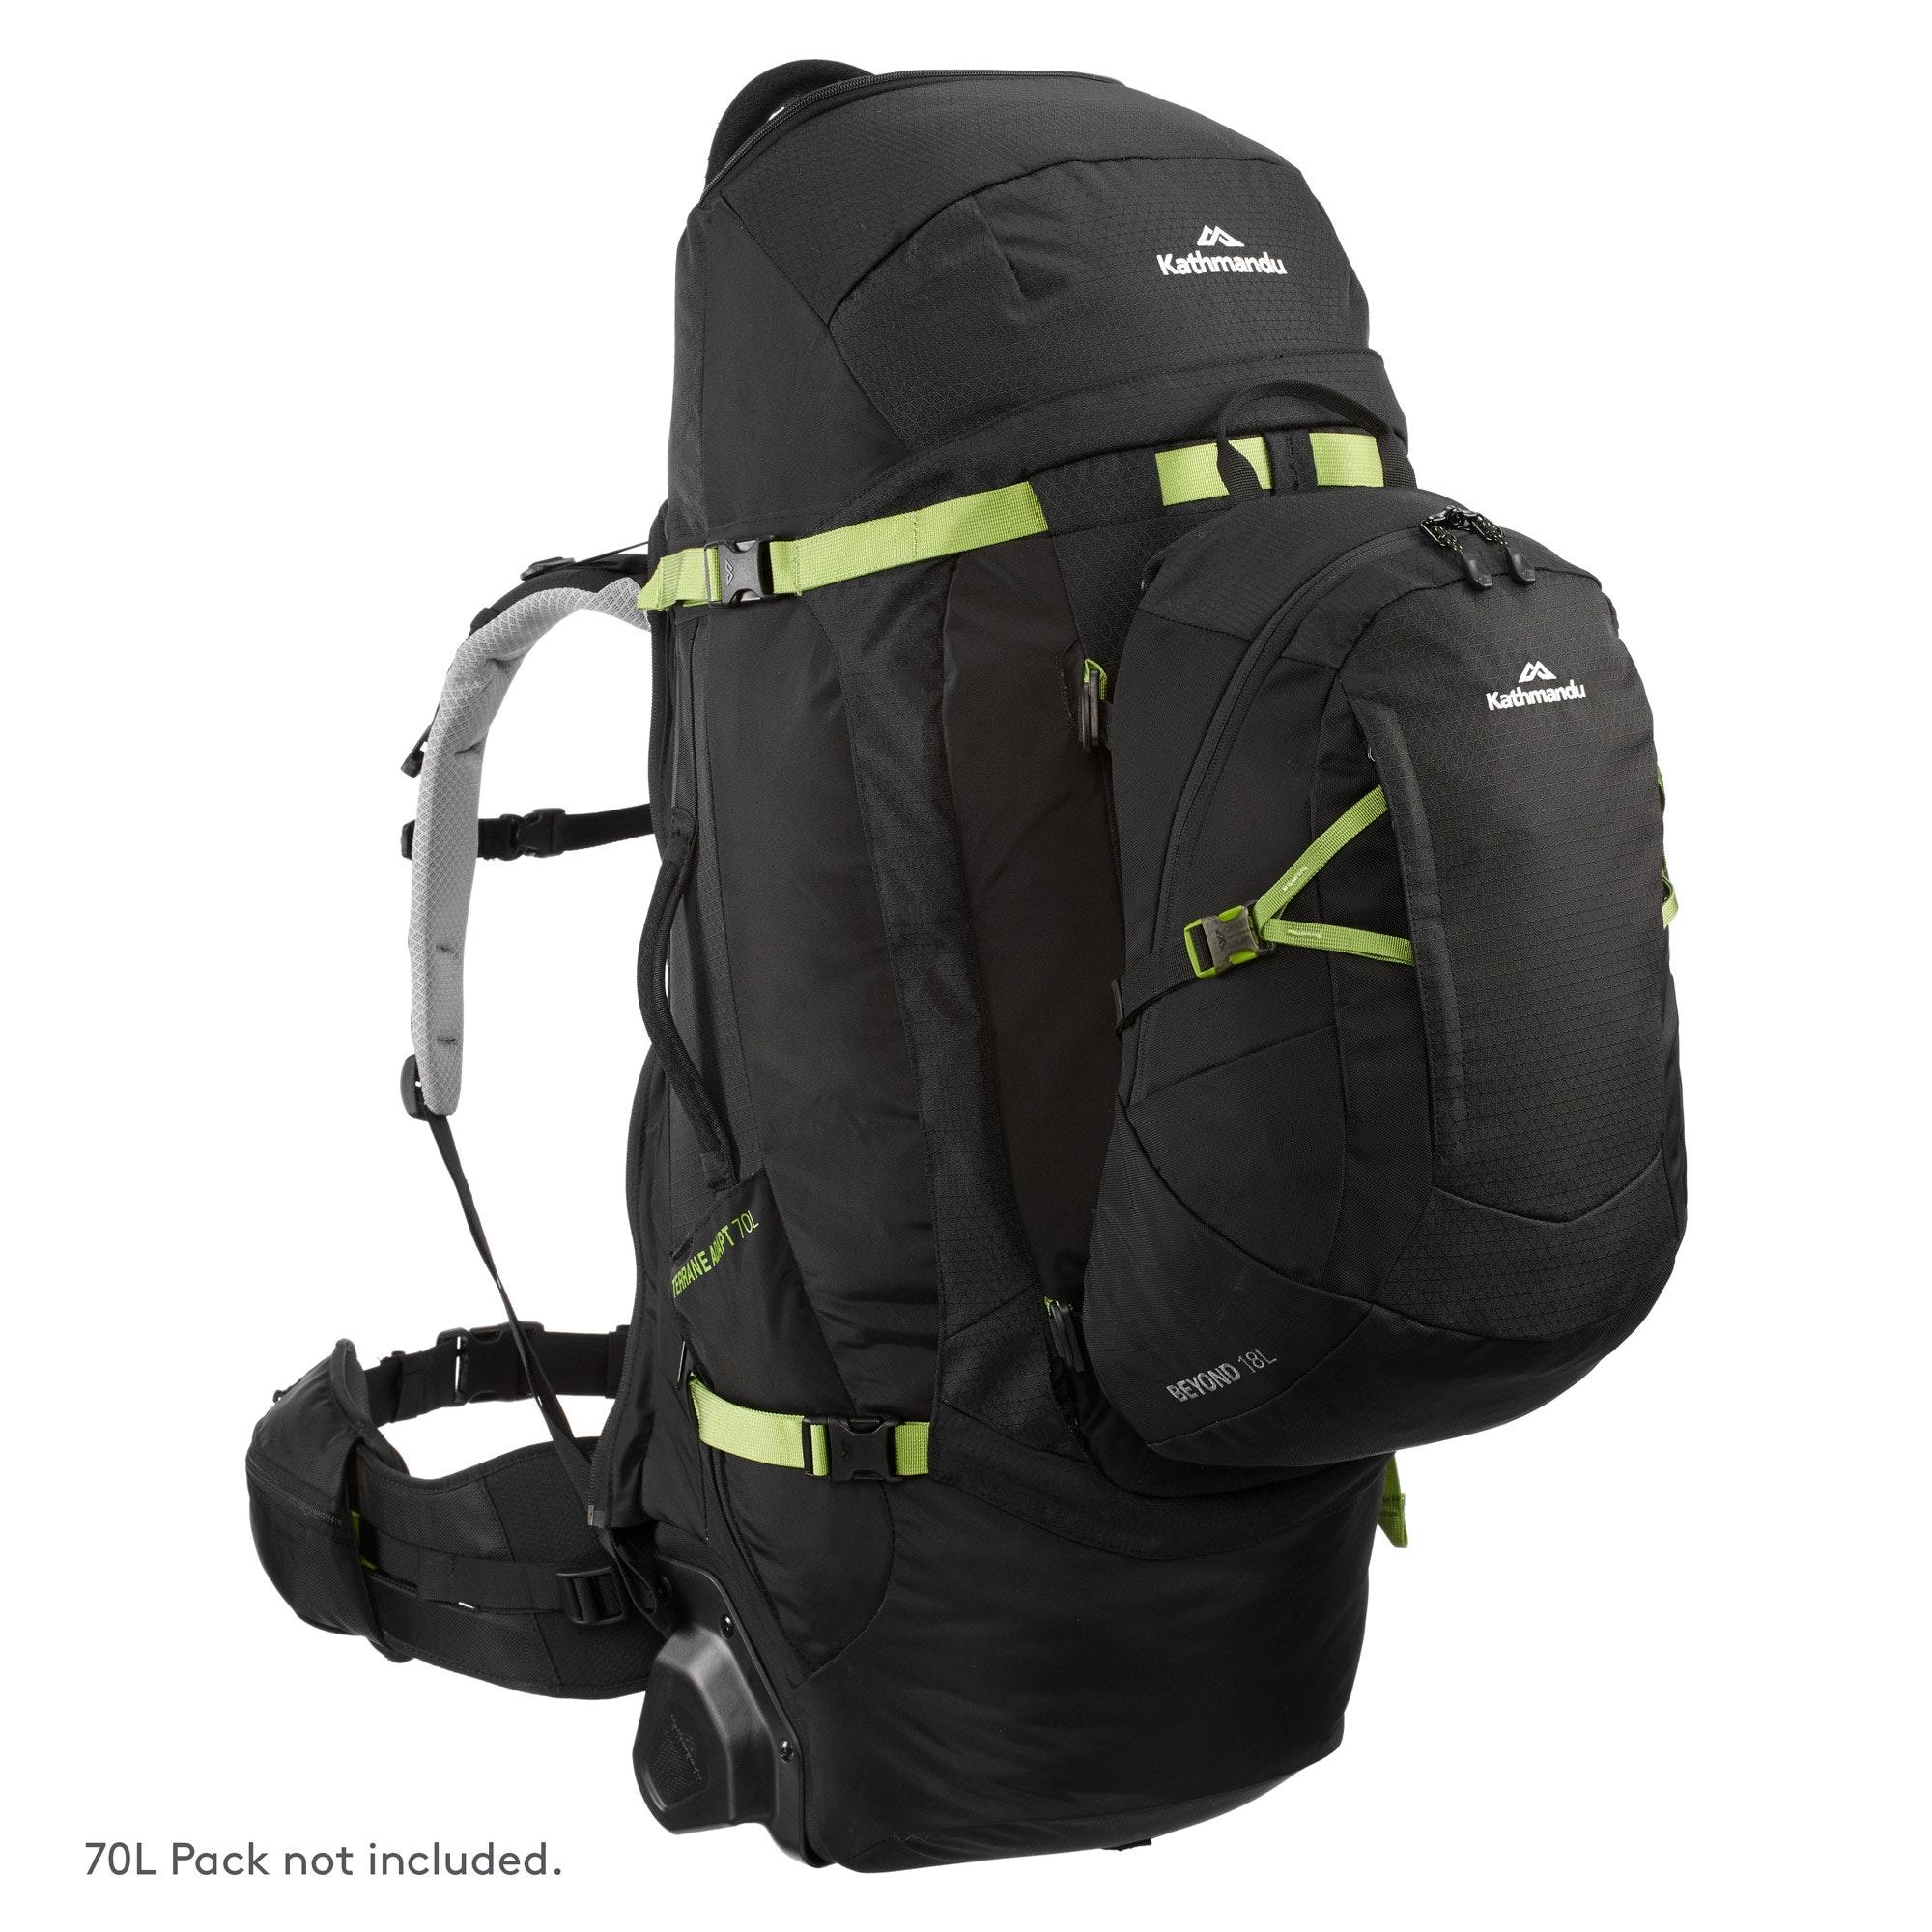 NEW-Kathmandu-Gluon-Beyond-18L-Travel-Pack-Lockable-Zip-Internal-Security-Zip